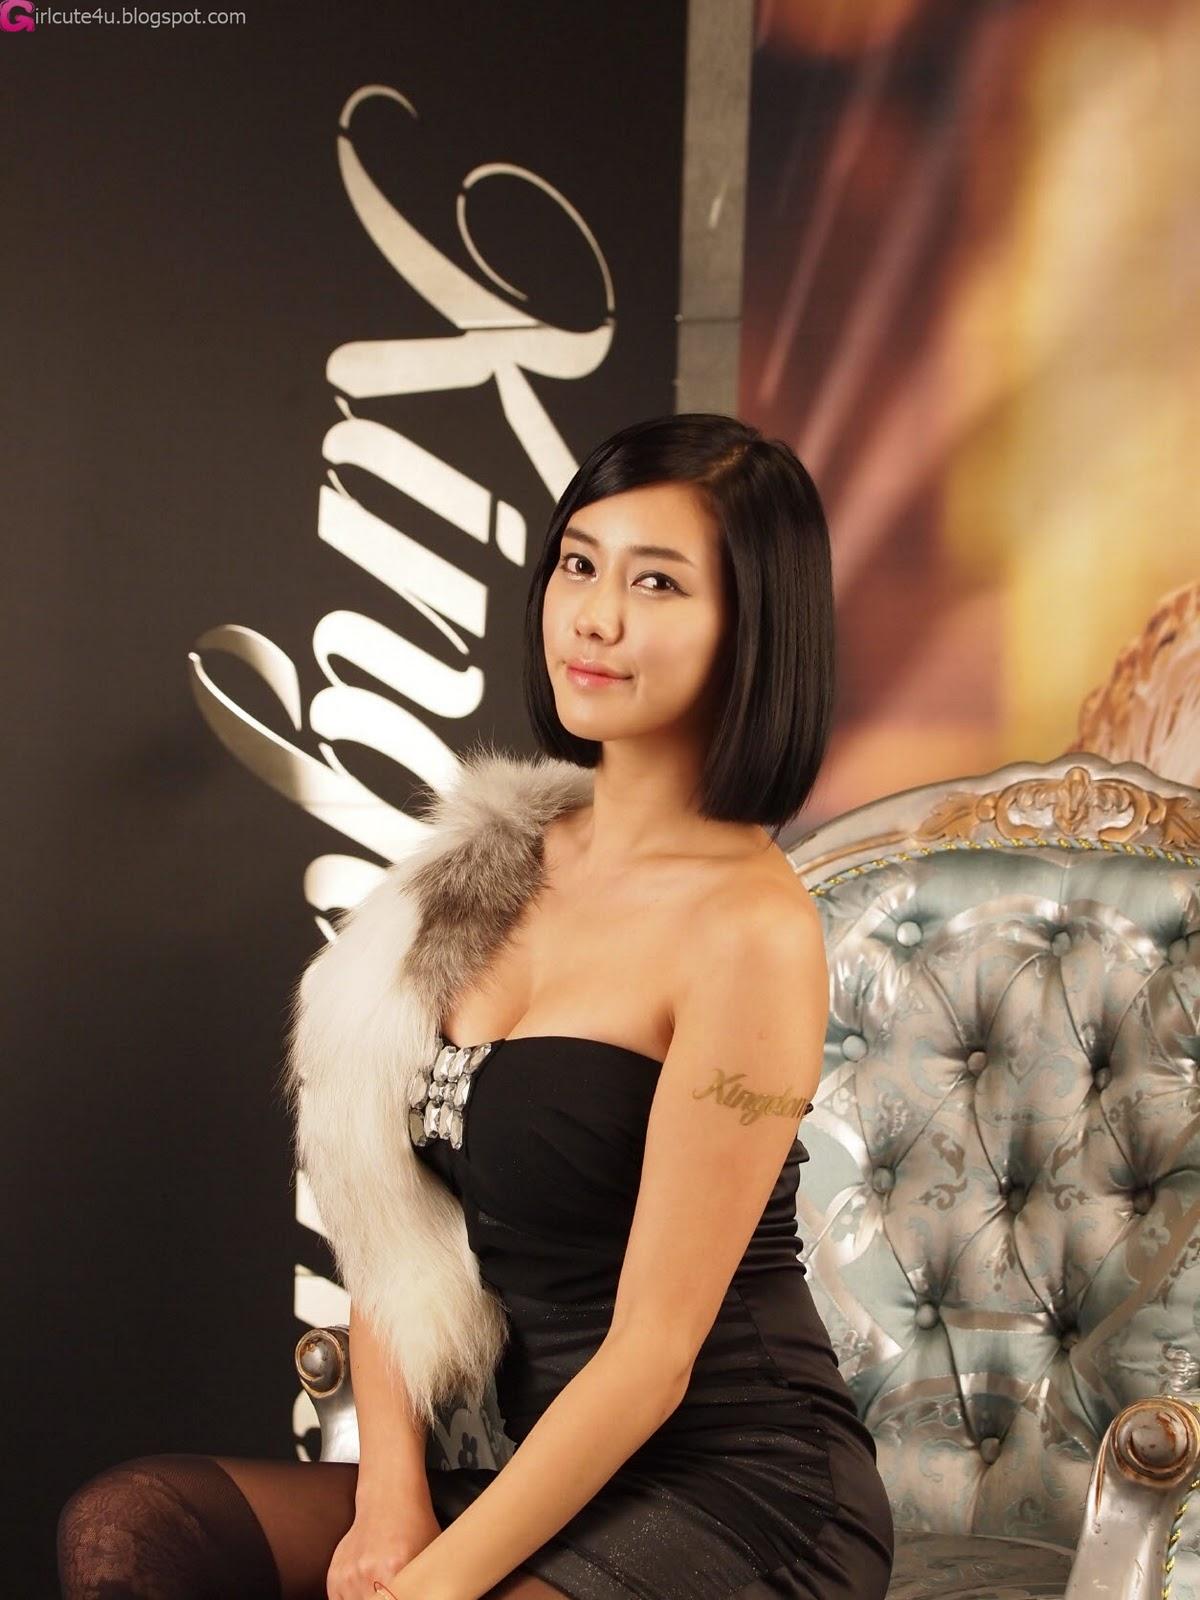 xxx nude girls: Kim Ha Yul FOHM 2013